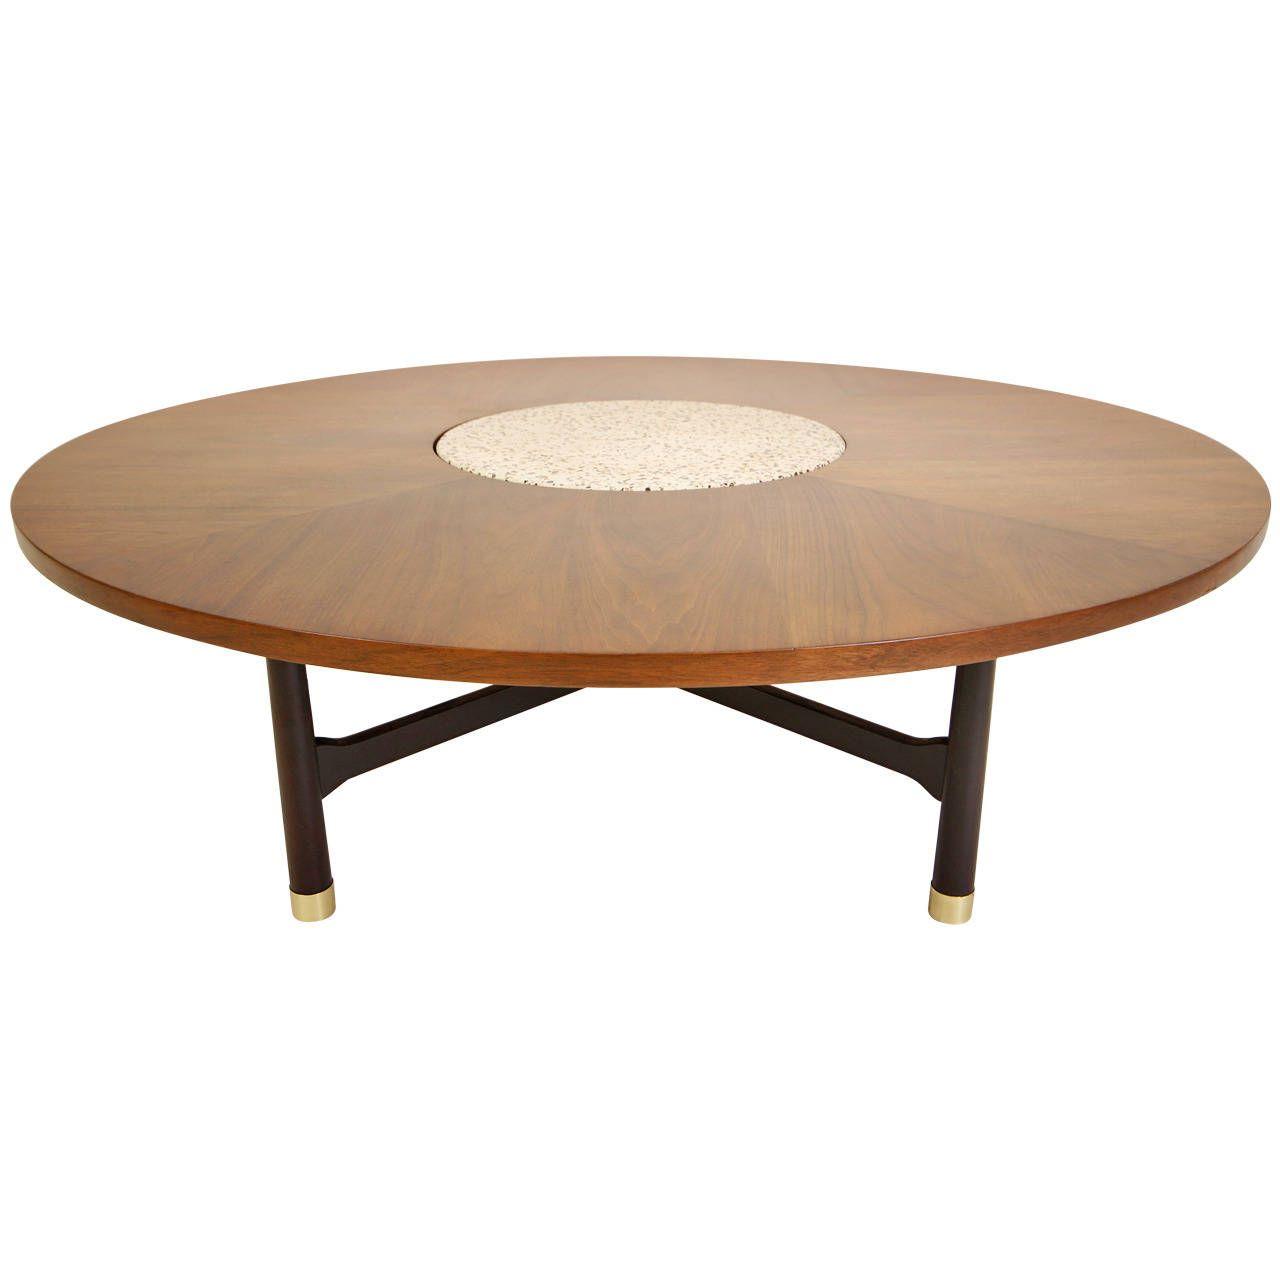 Harvey Probber Walnut and Terrazzo Low Coffee Table 1960s